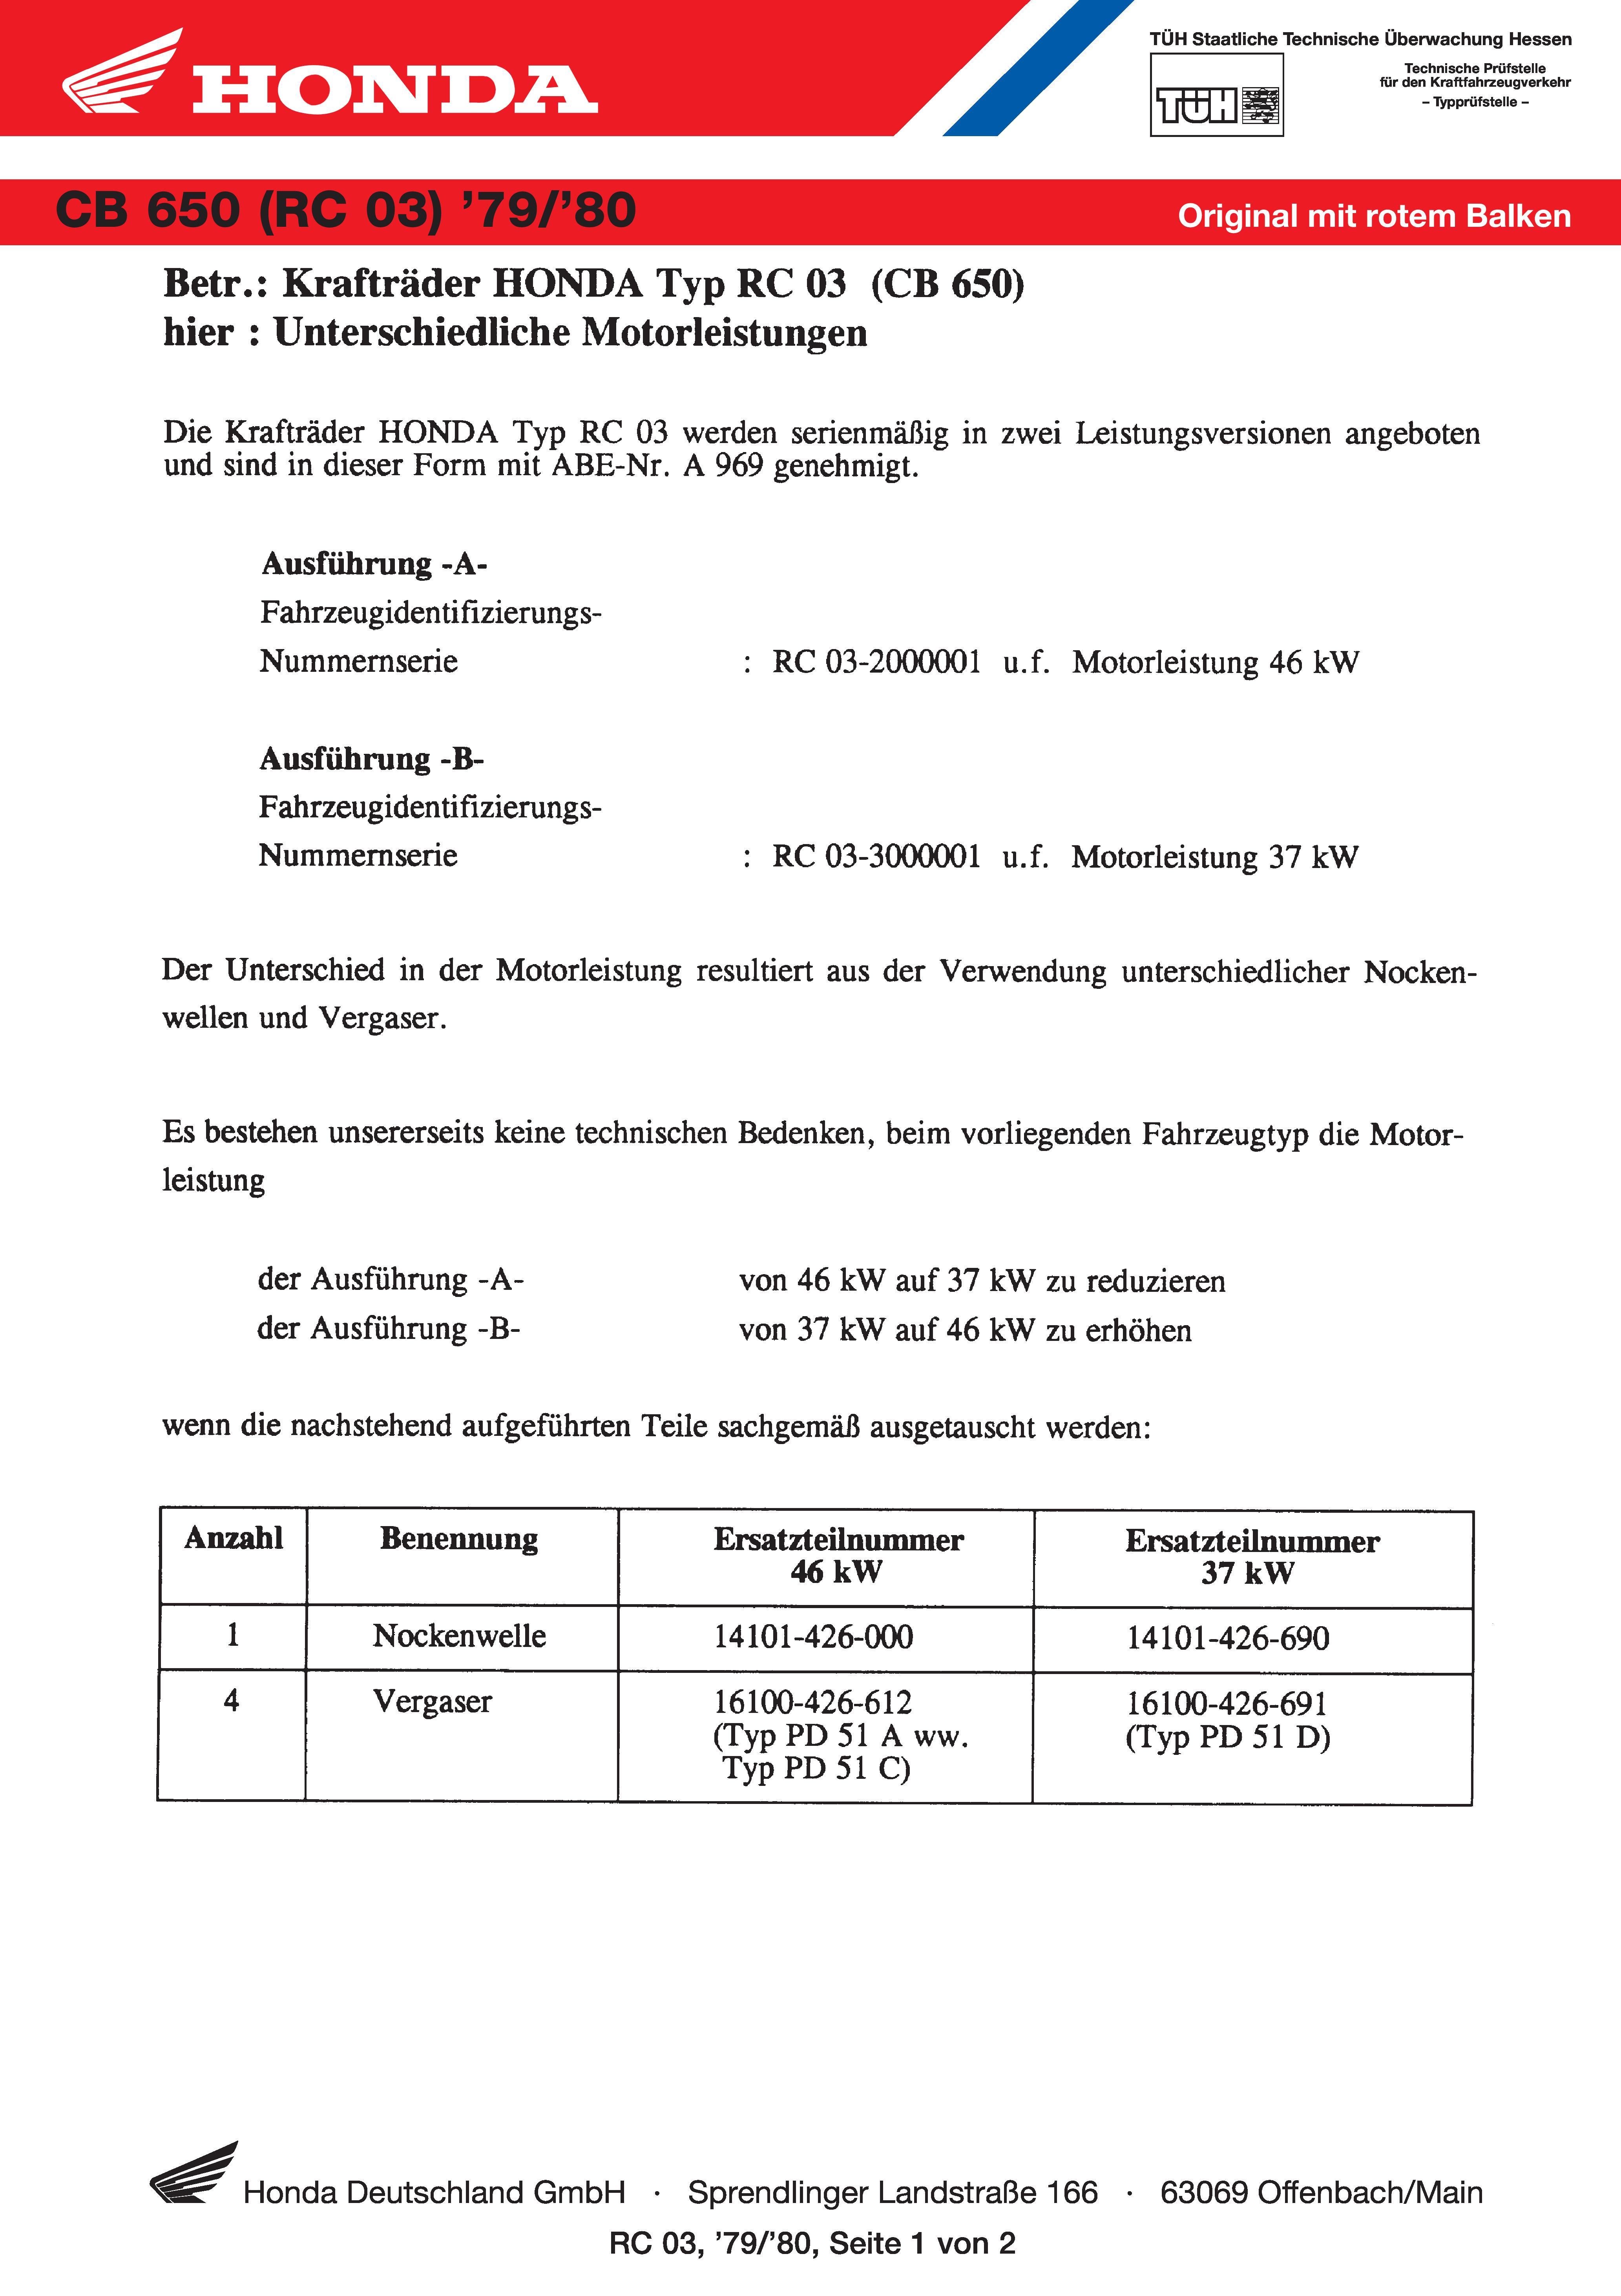 Conformity declaration Honda CB650 RC03 (Germany) (1979)